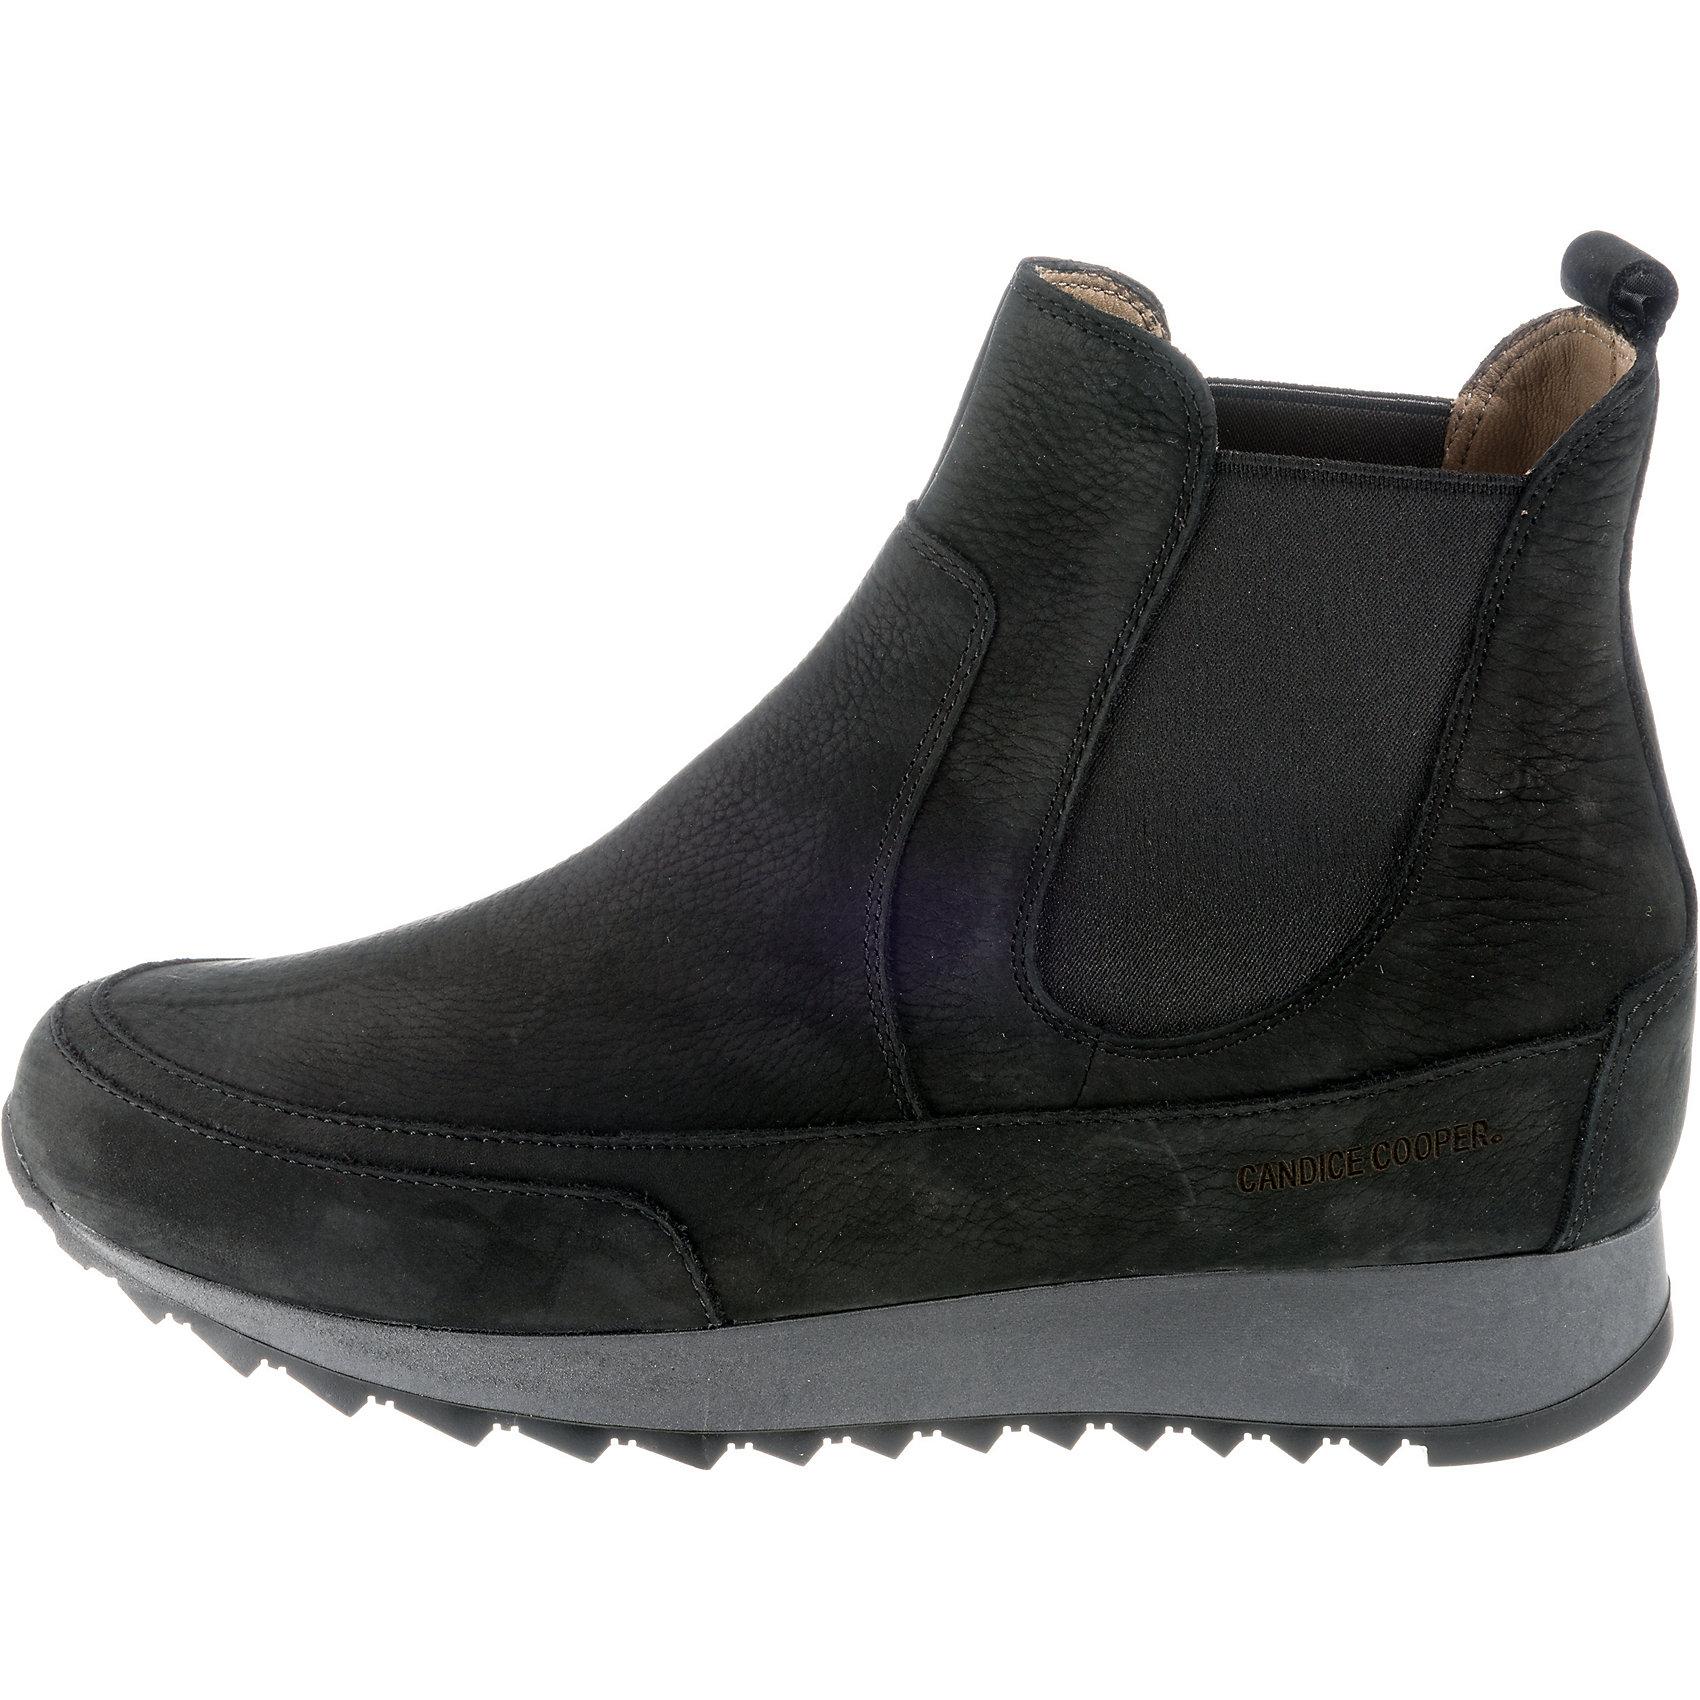 grau Neu Cooper Candice Für Damen High Sneakers Schwarz 8290930 qVSUzMGp